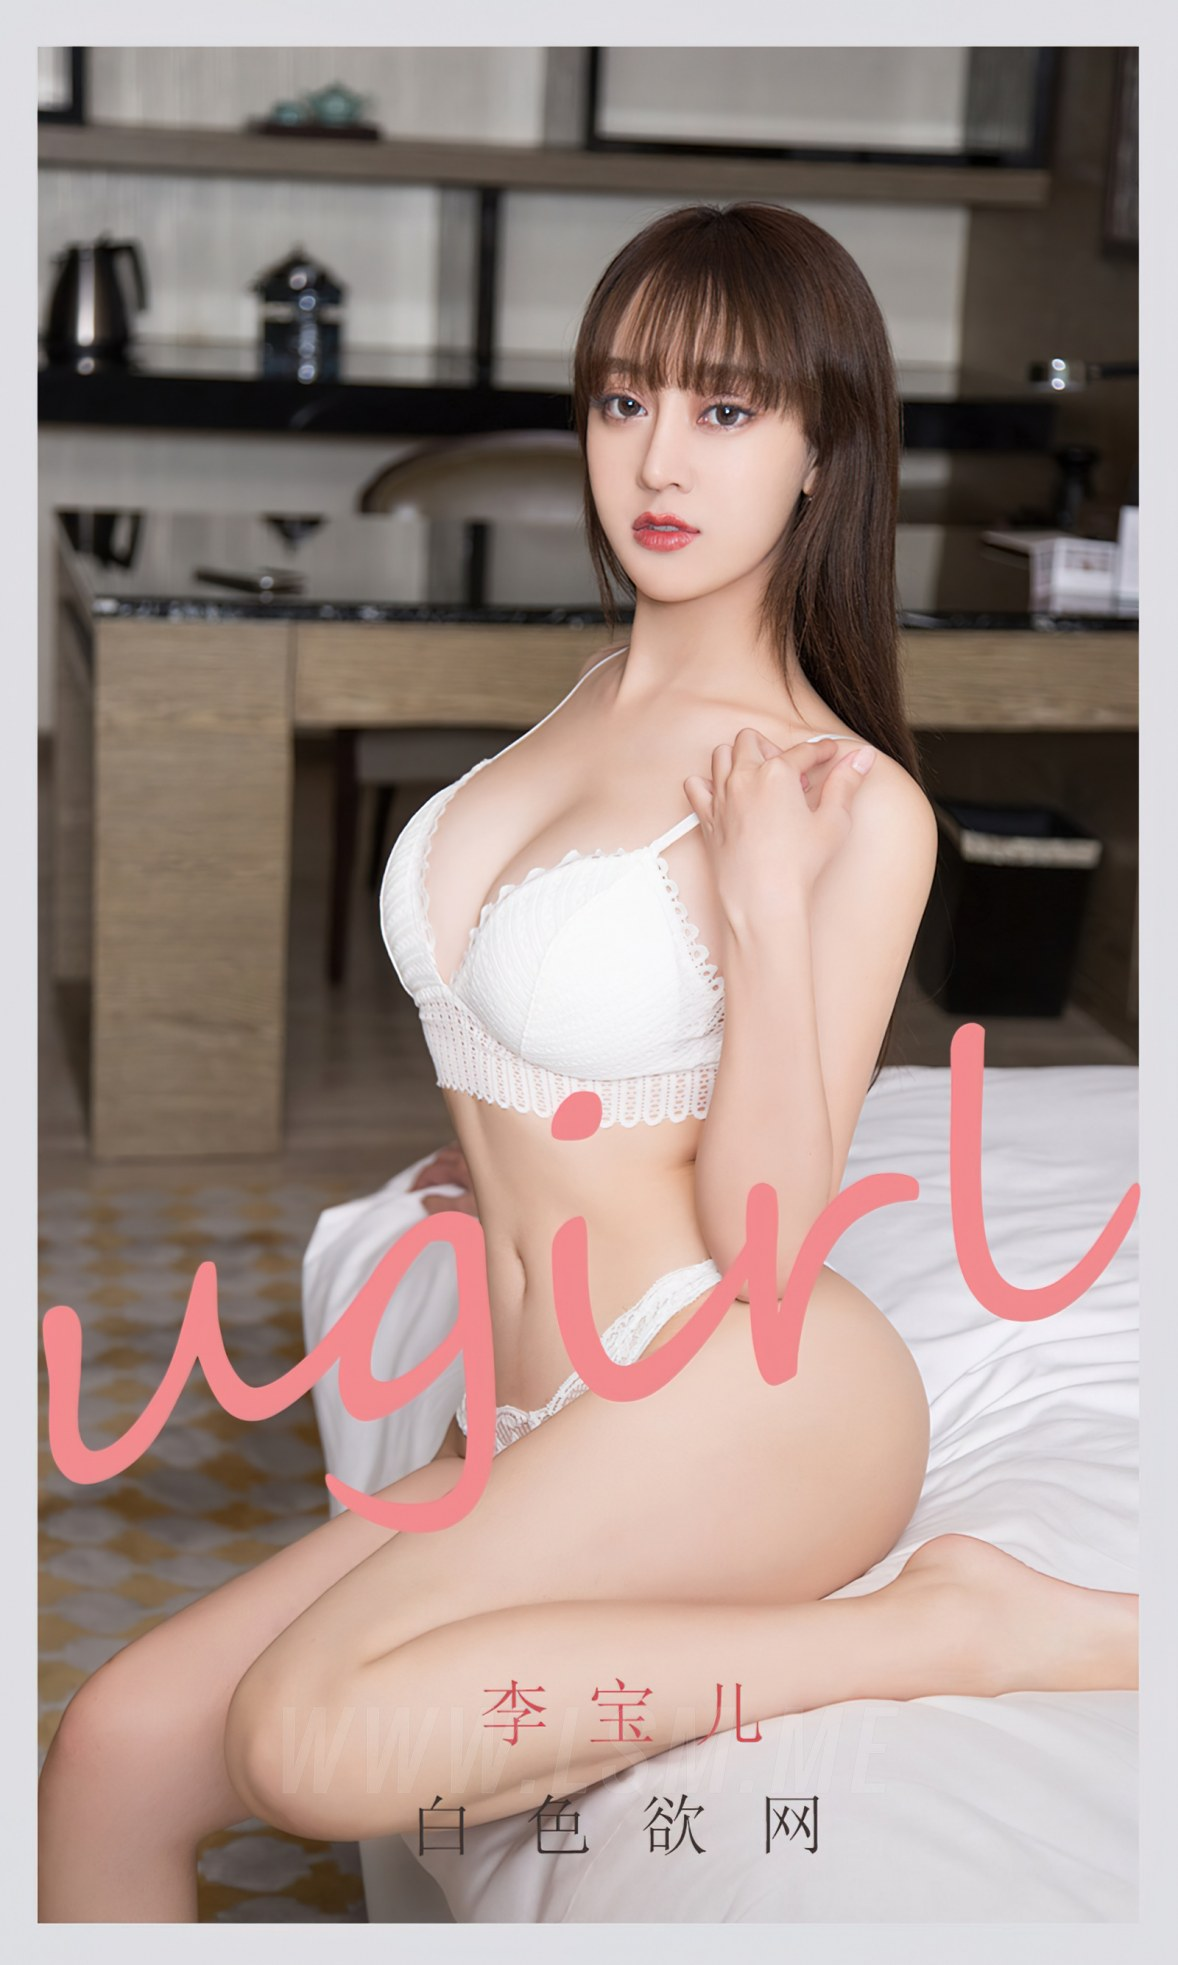 UGirls 爱尤物 No.2169  李宝儿 白色欲望 - 1